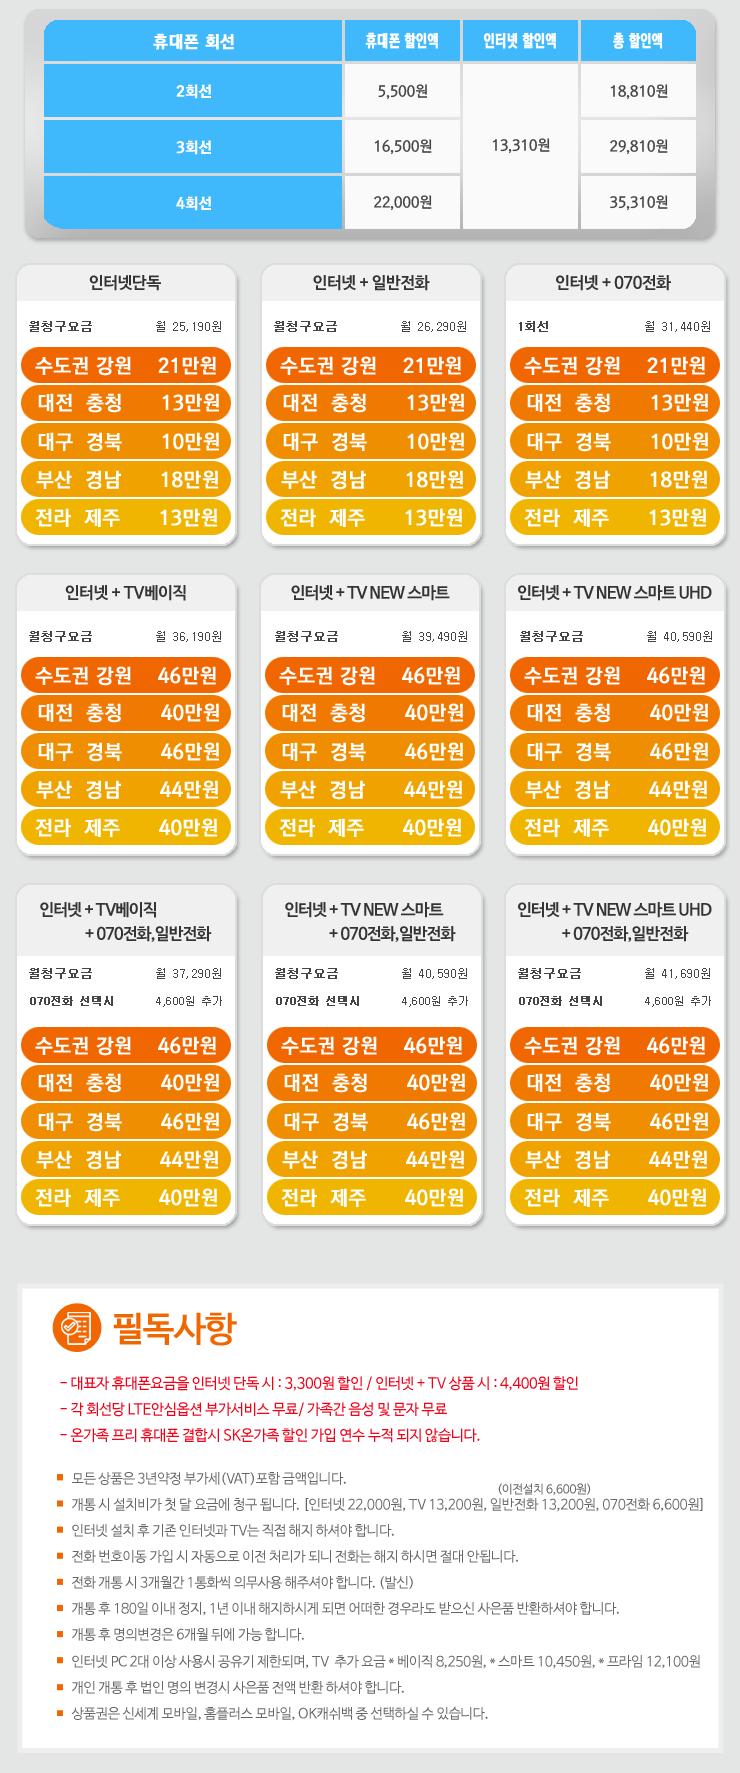 SK_broadband_plan_1G_740.png